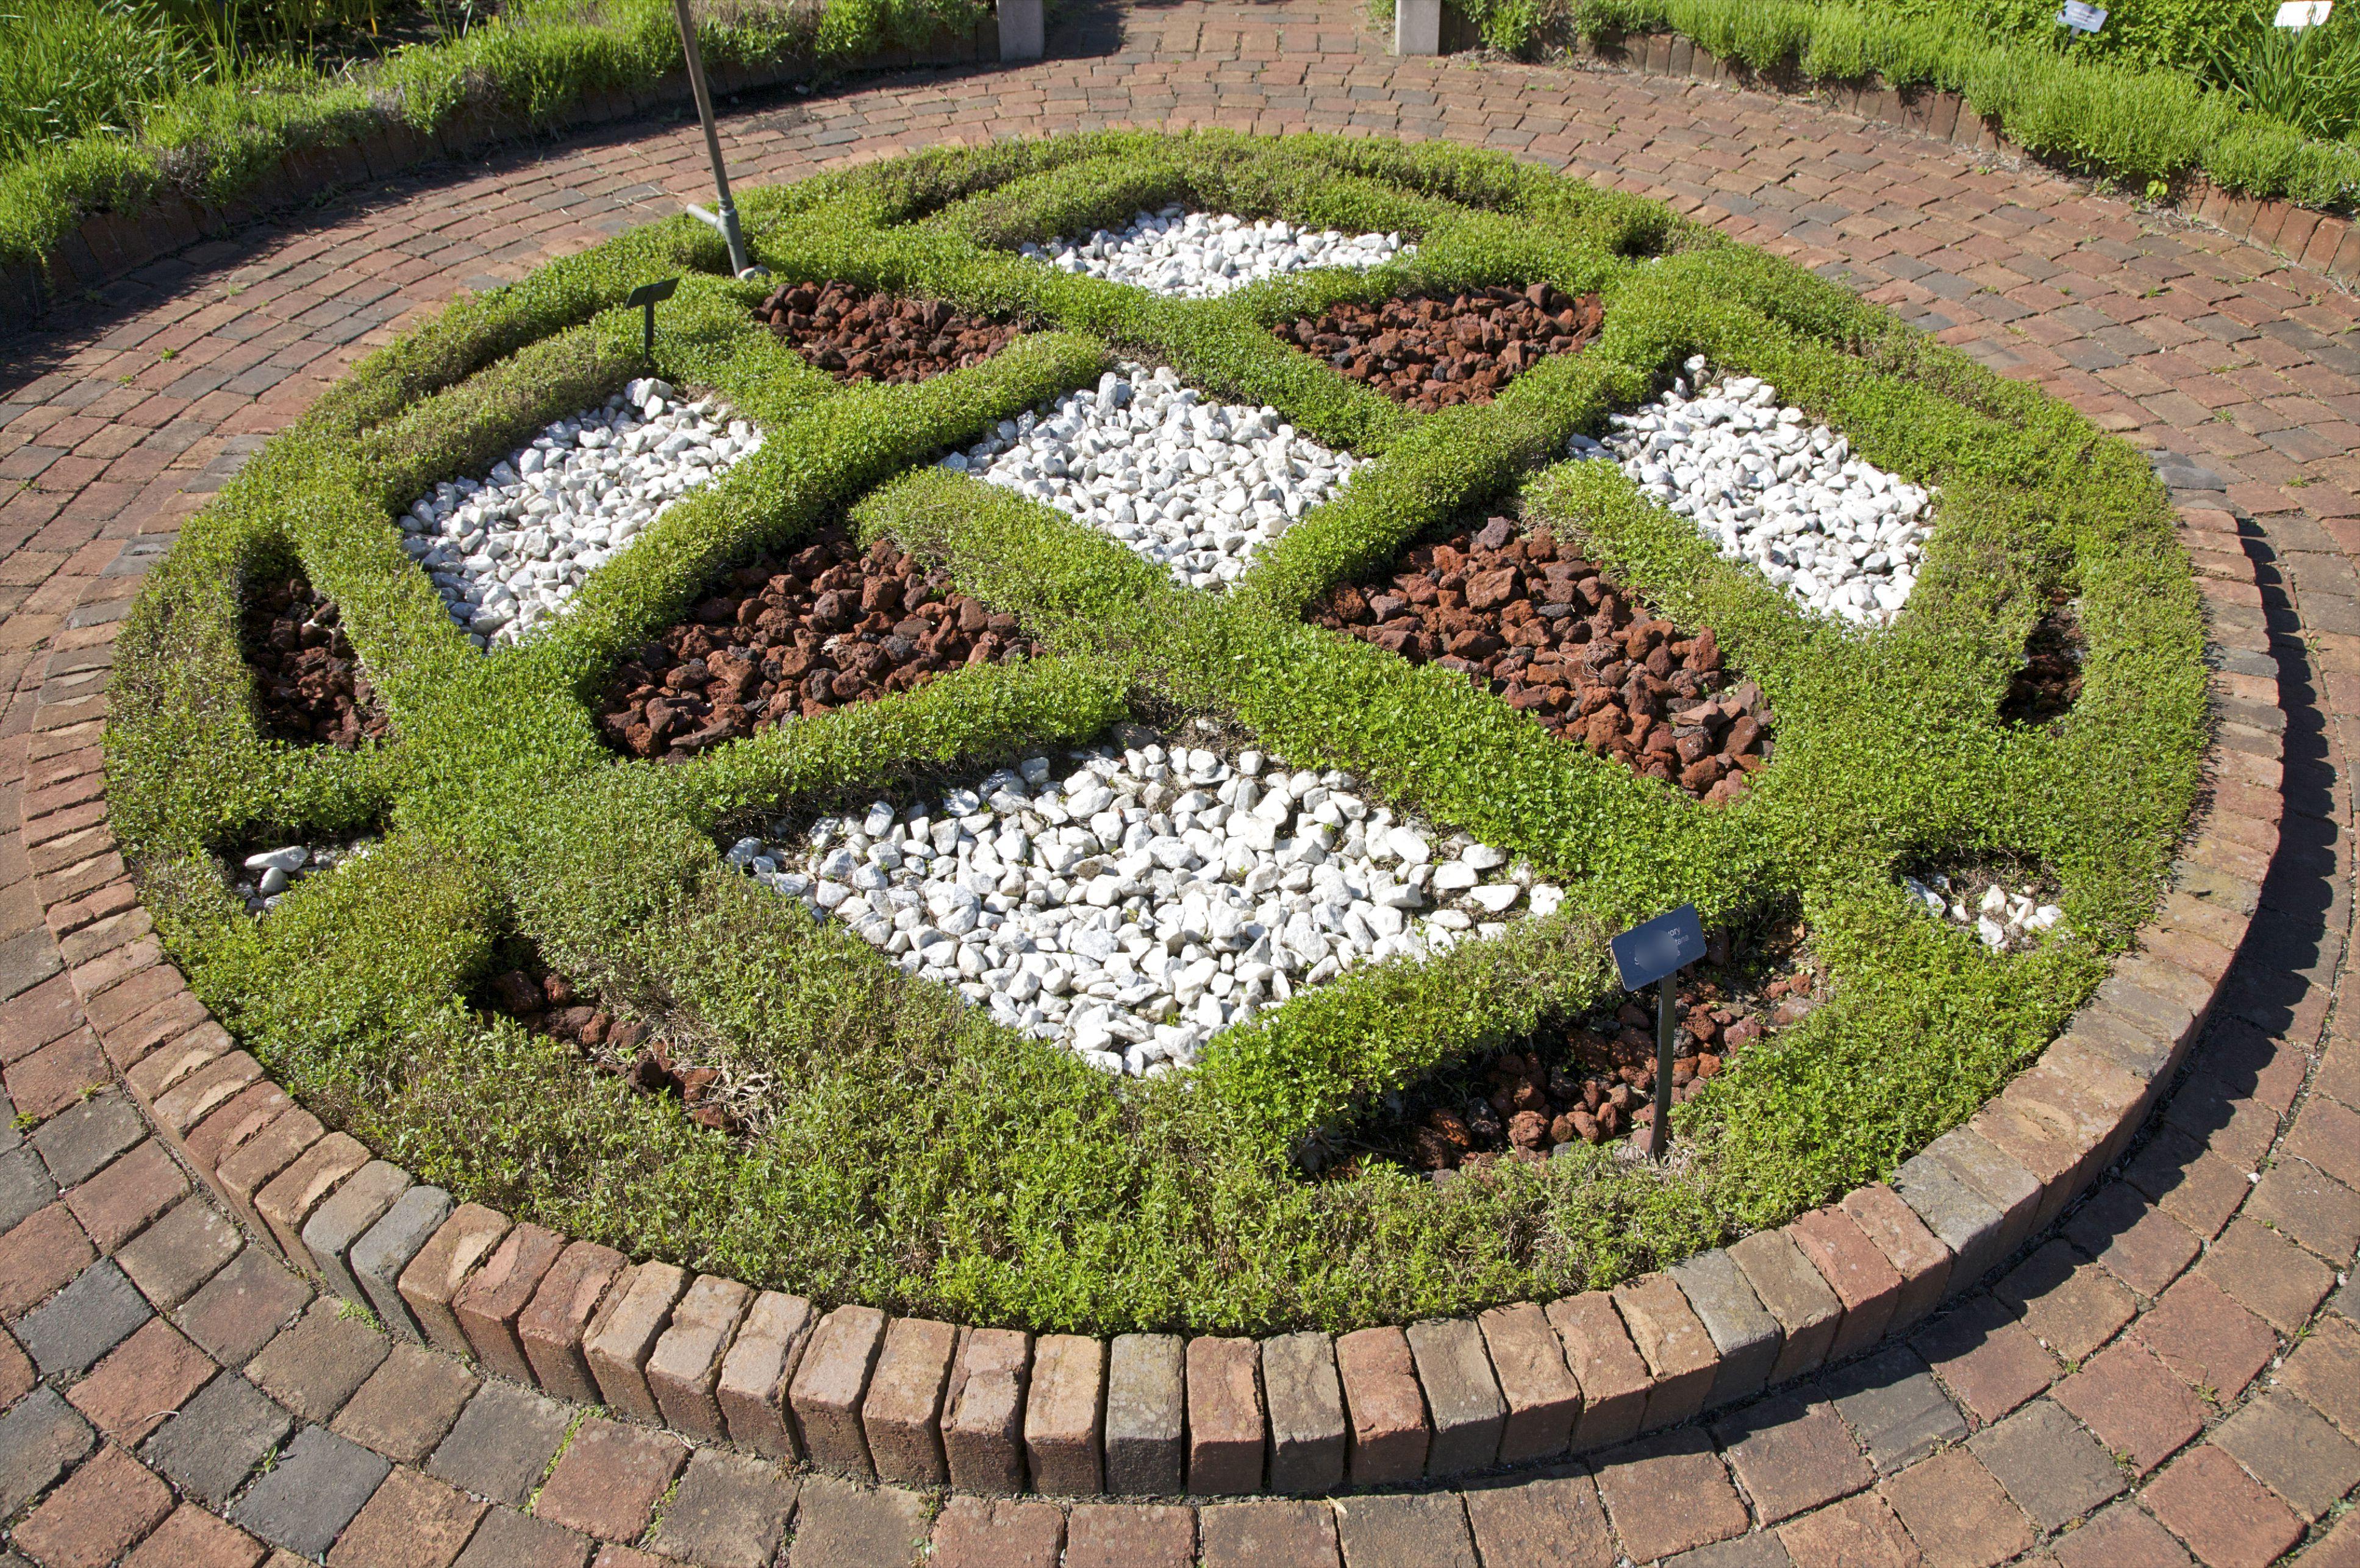 Botanical Gardens and Public Gardens in Metro Detroit